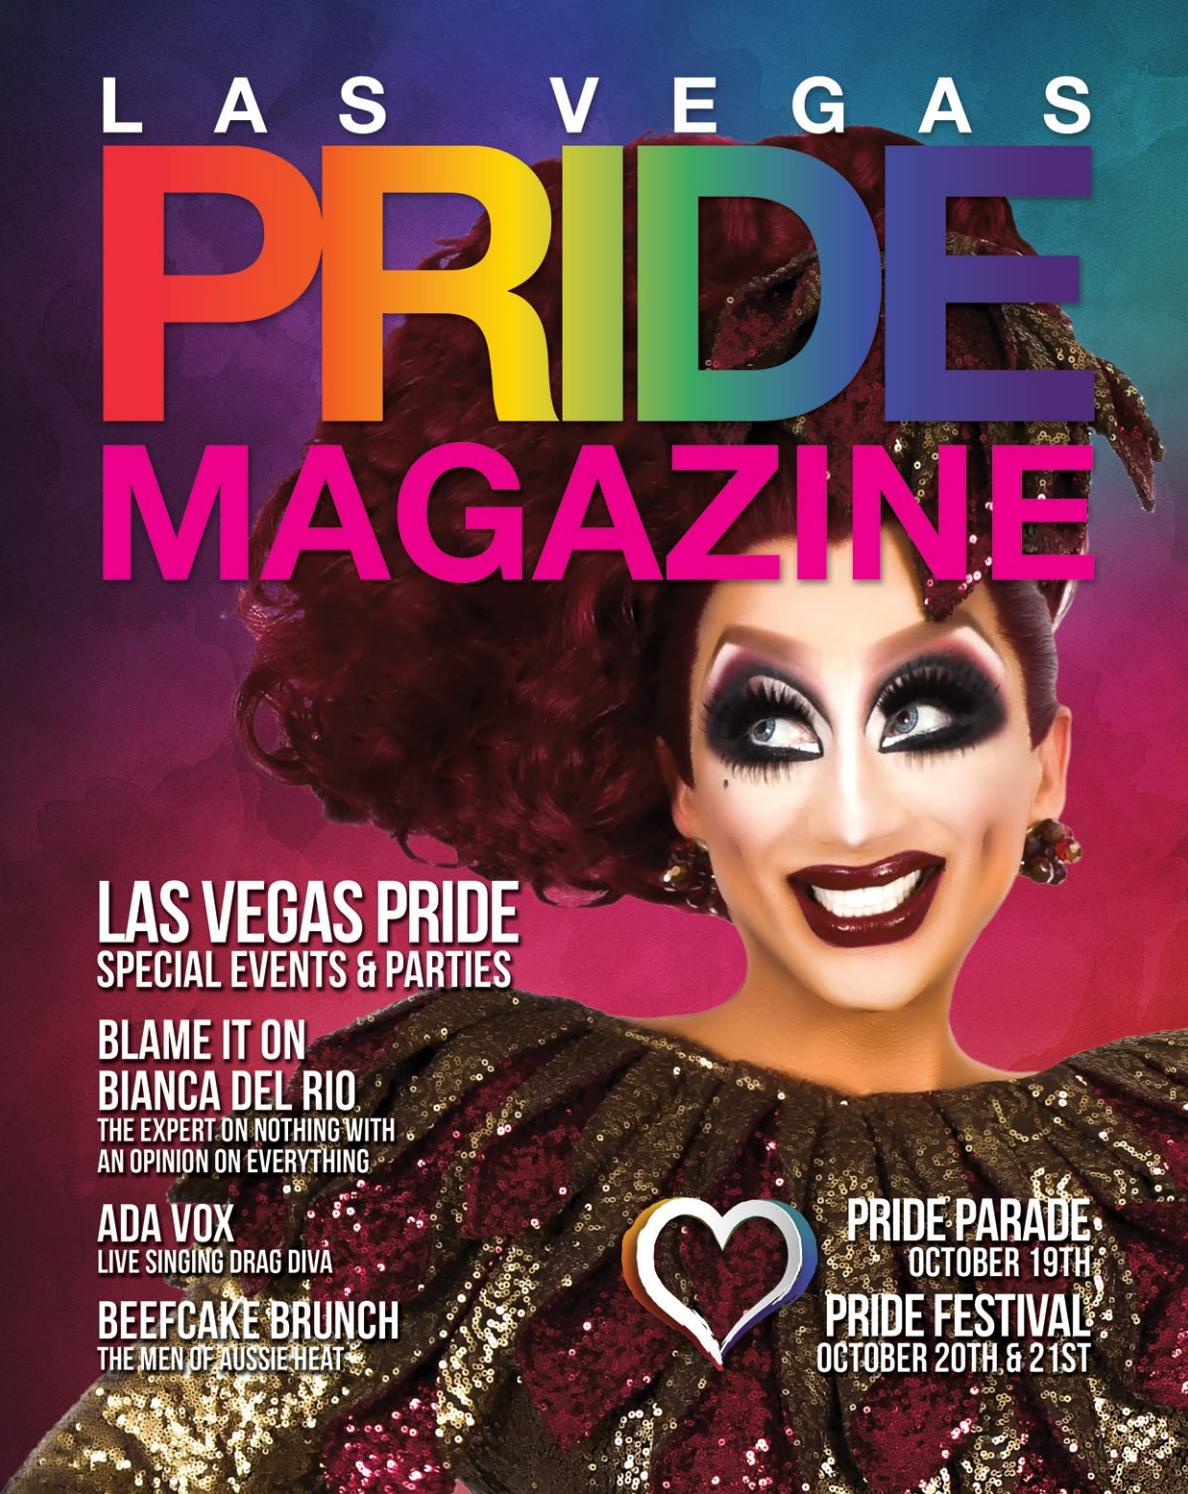 3f4efd22052 Las Vegas PRIDE Magazine - Issue 22 by Las Vegas Pride - issuu